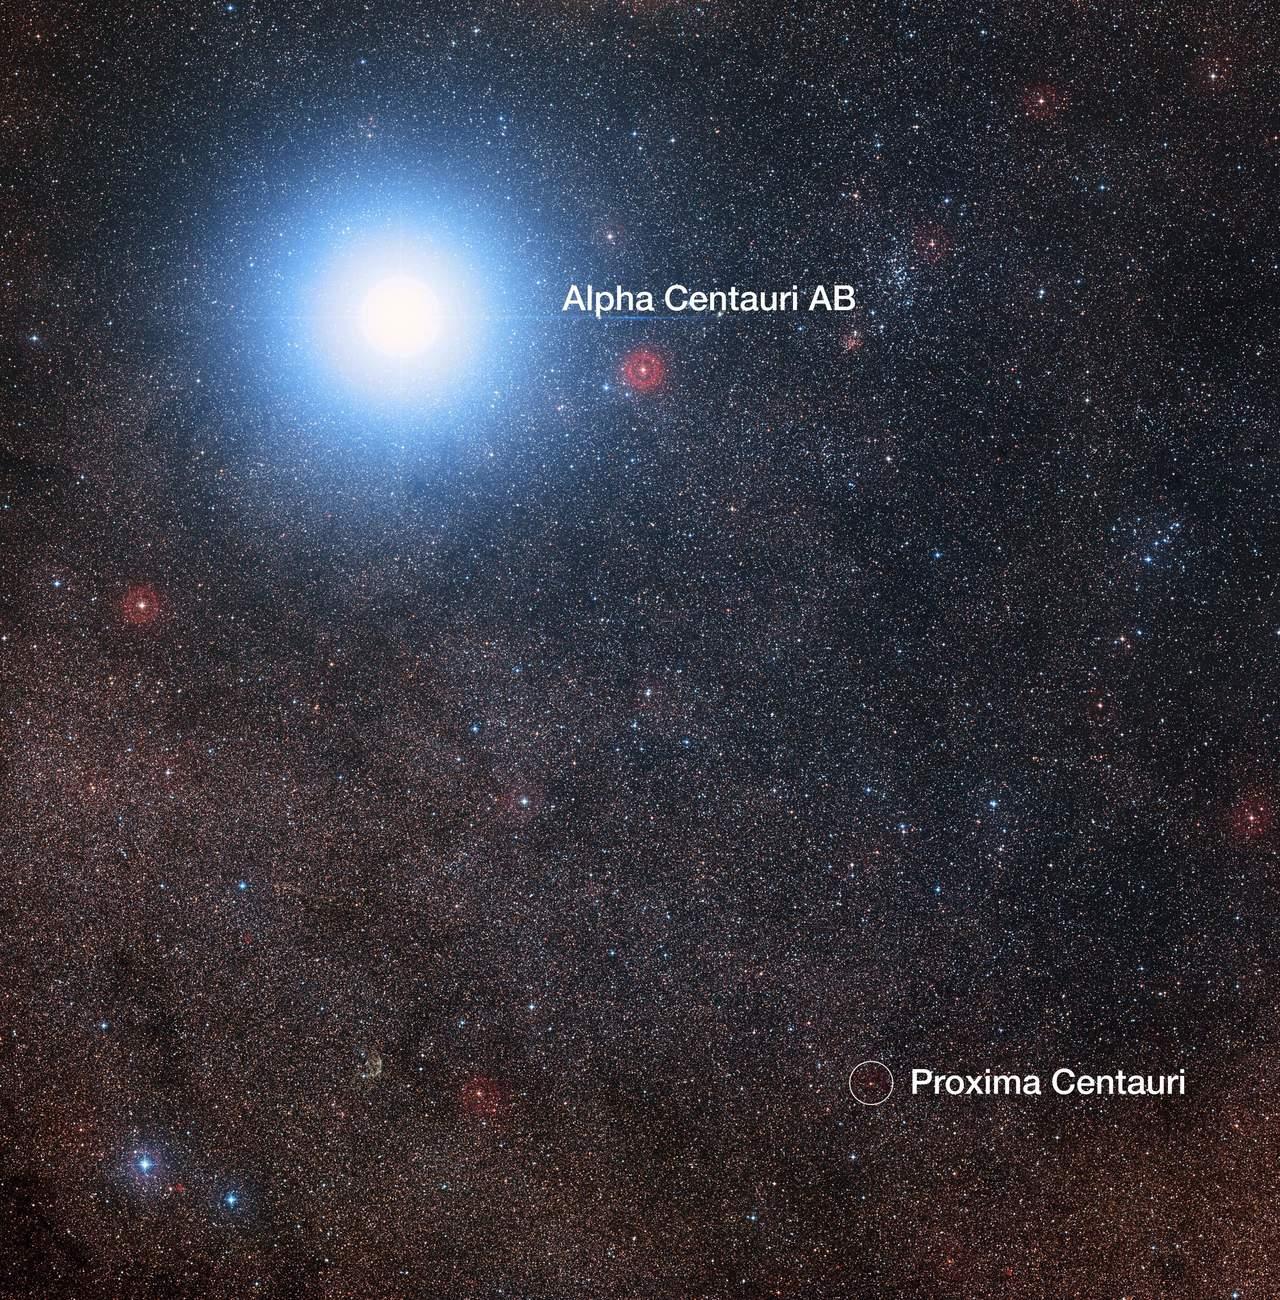 NASA revela nuevos resultados sobre Alfa Centauri